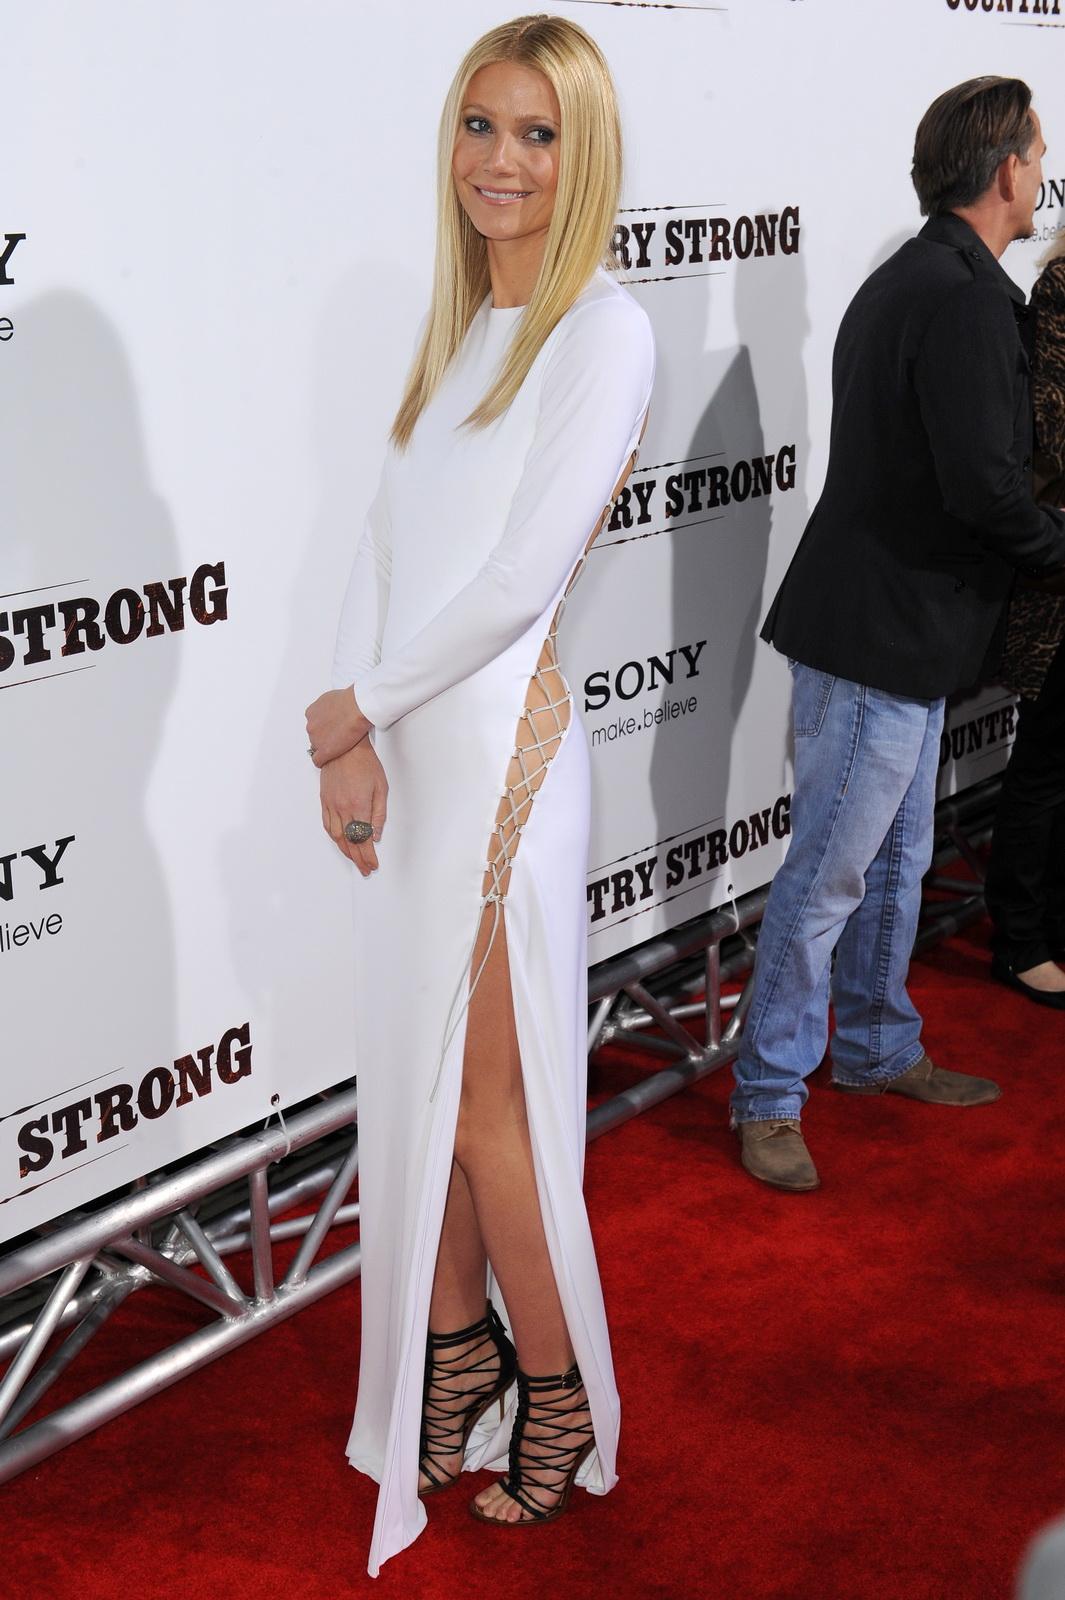 http://3.bp.blogspot.com/_NRGPIrDtEg8/TQsowGtfiYI/AAAAAAAAAaA/rrFmfTGJvy8/s1600/Gwyneth_Paltrow_without_panties_and_bra_5.jpg